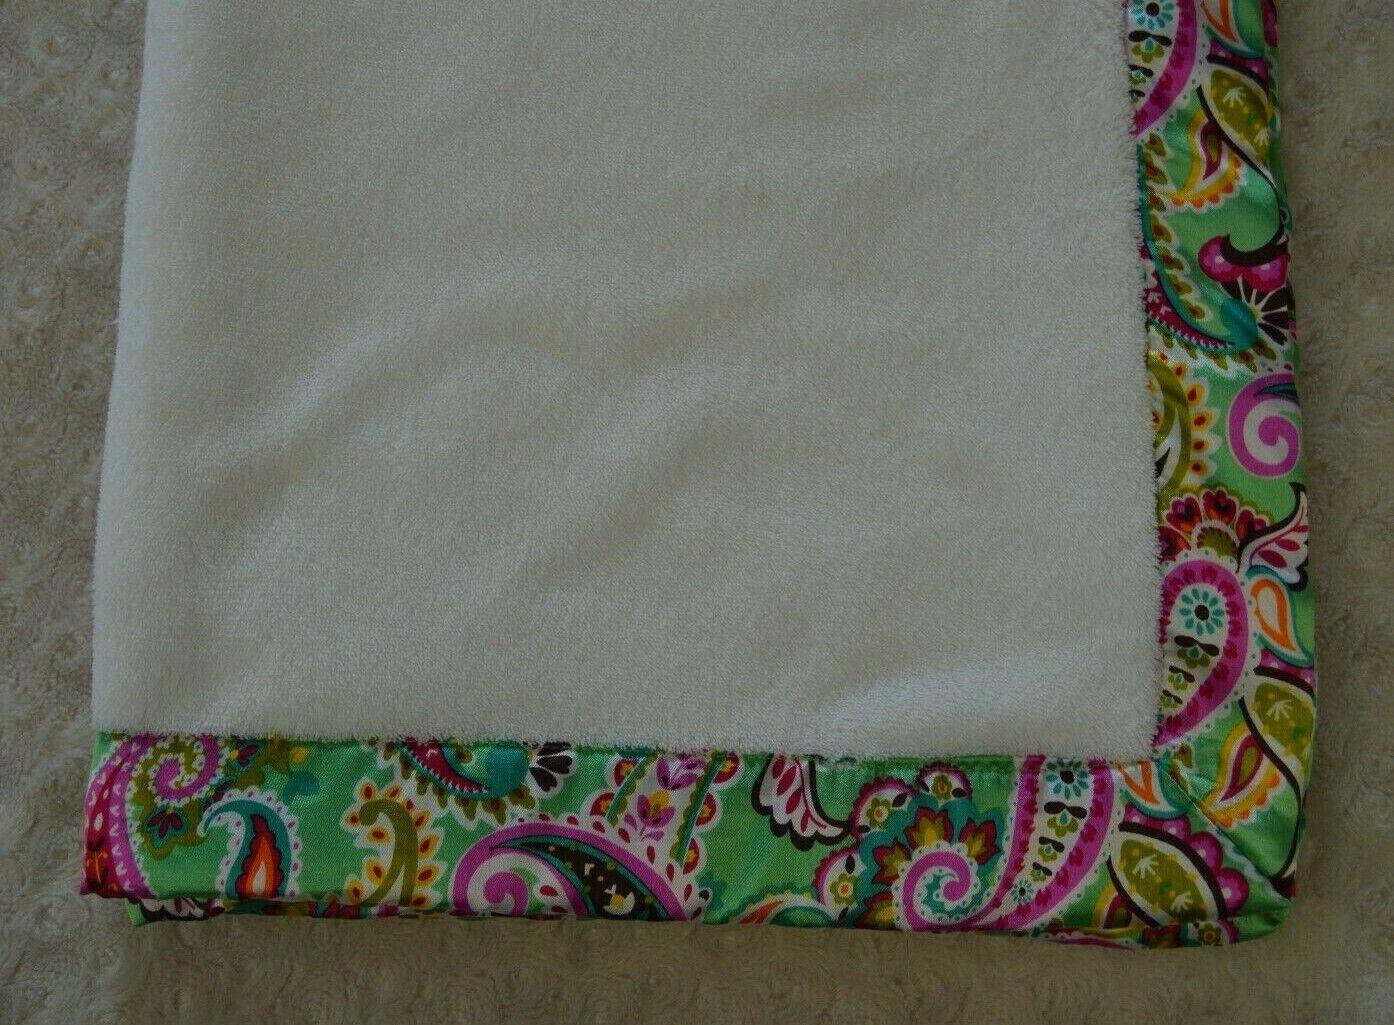 Vera Bradley Tutti Frutti Baby Blanket Green White Paisley Silky Edge Lovey - $54.95